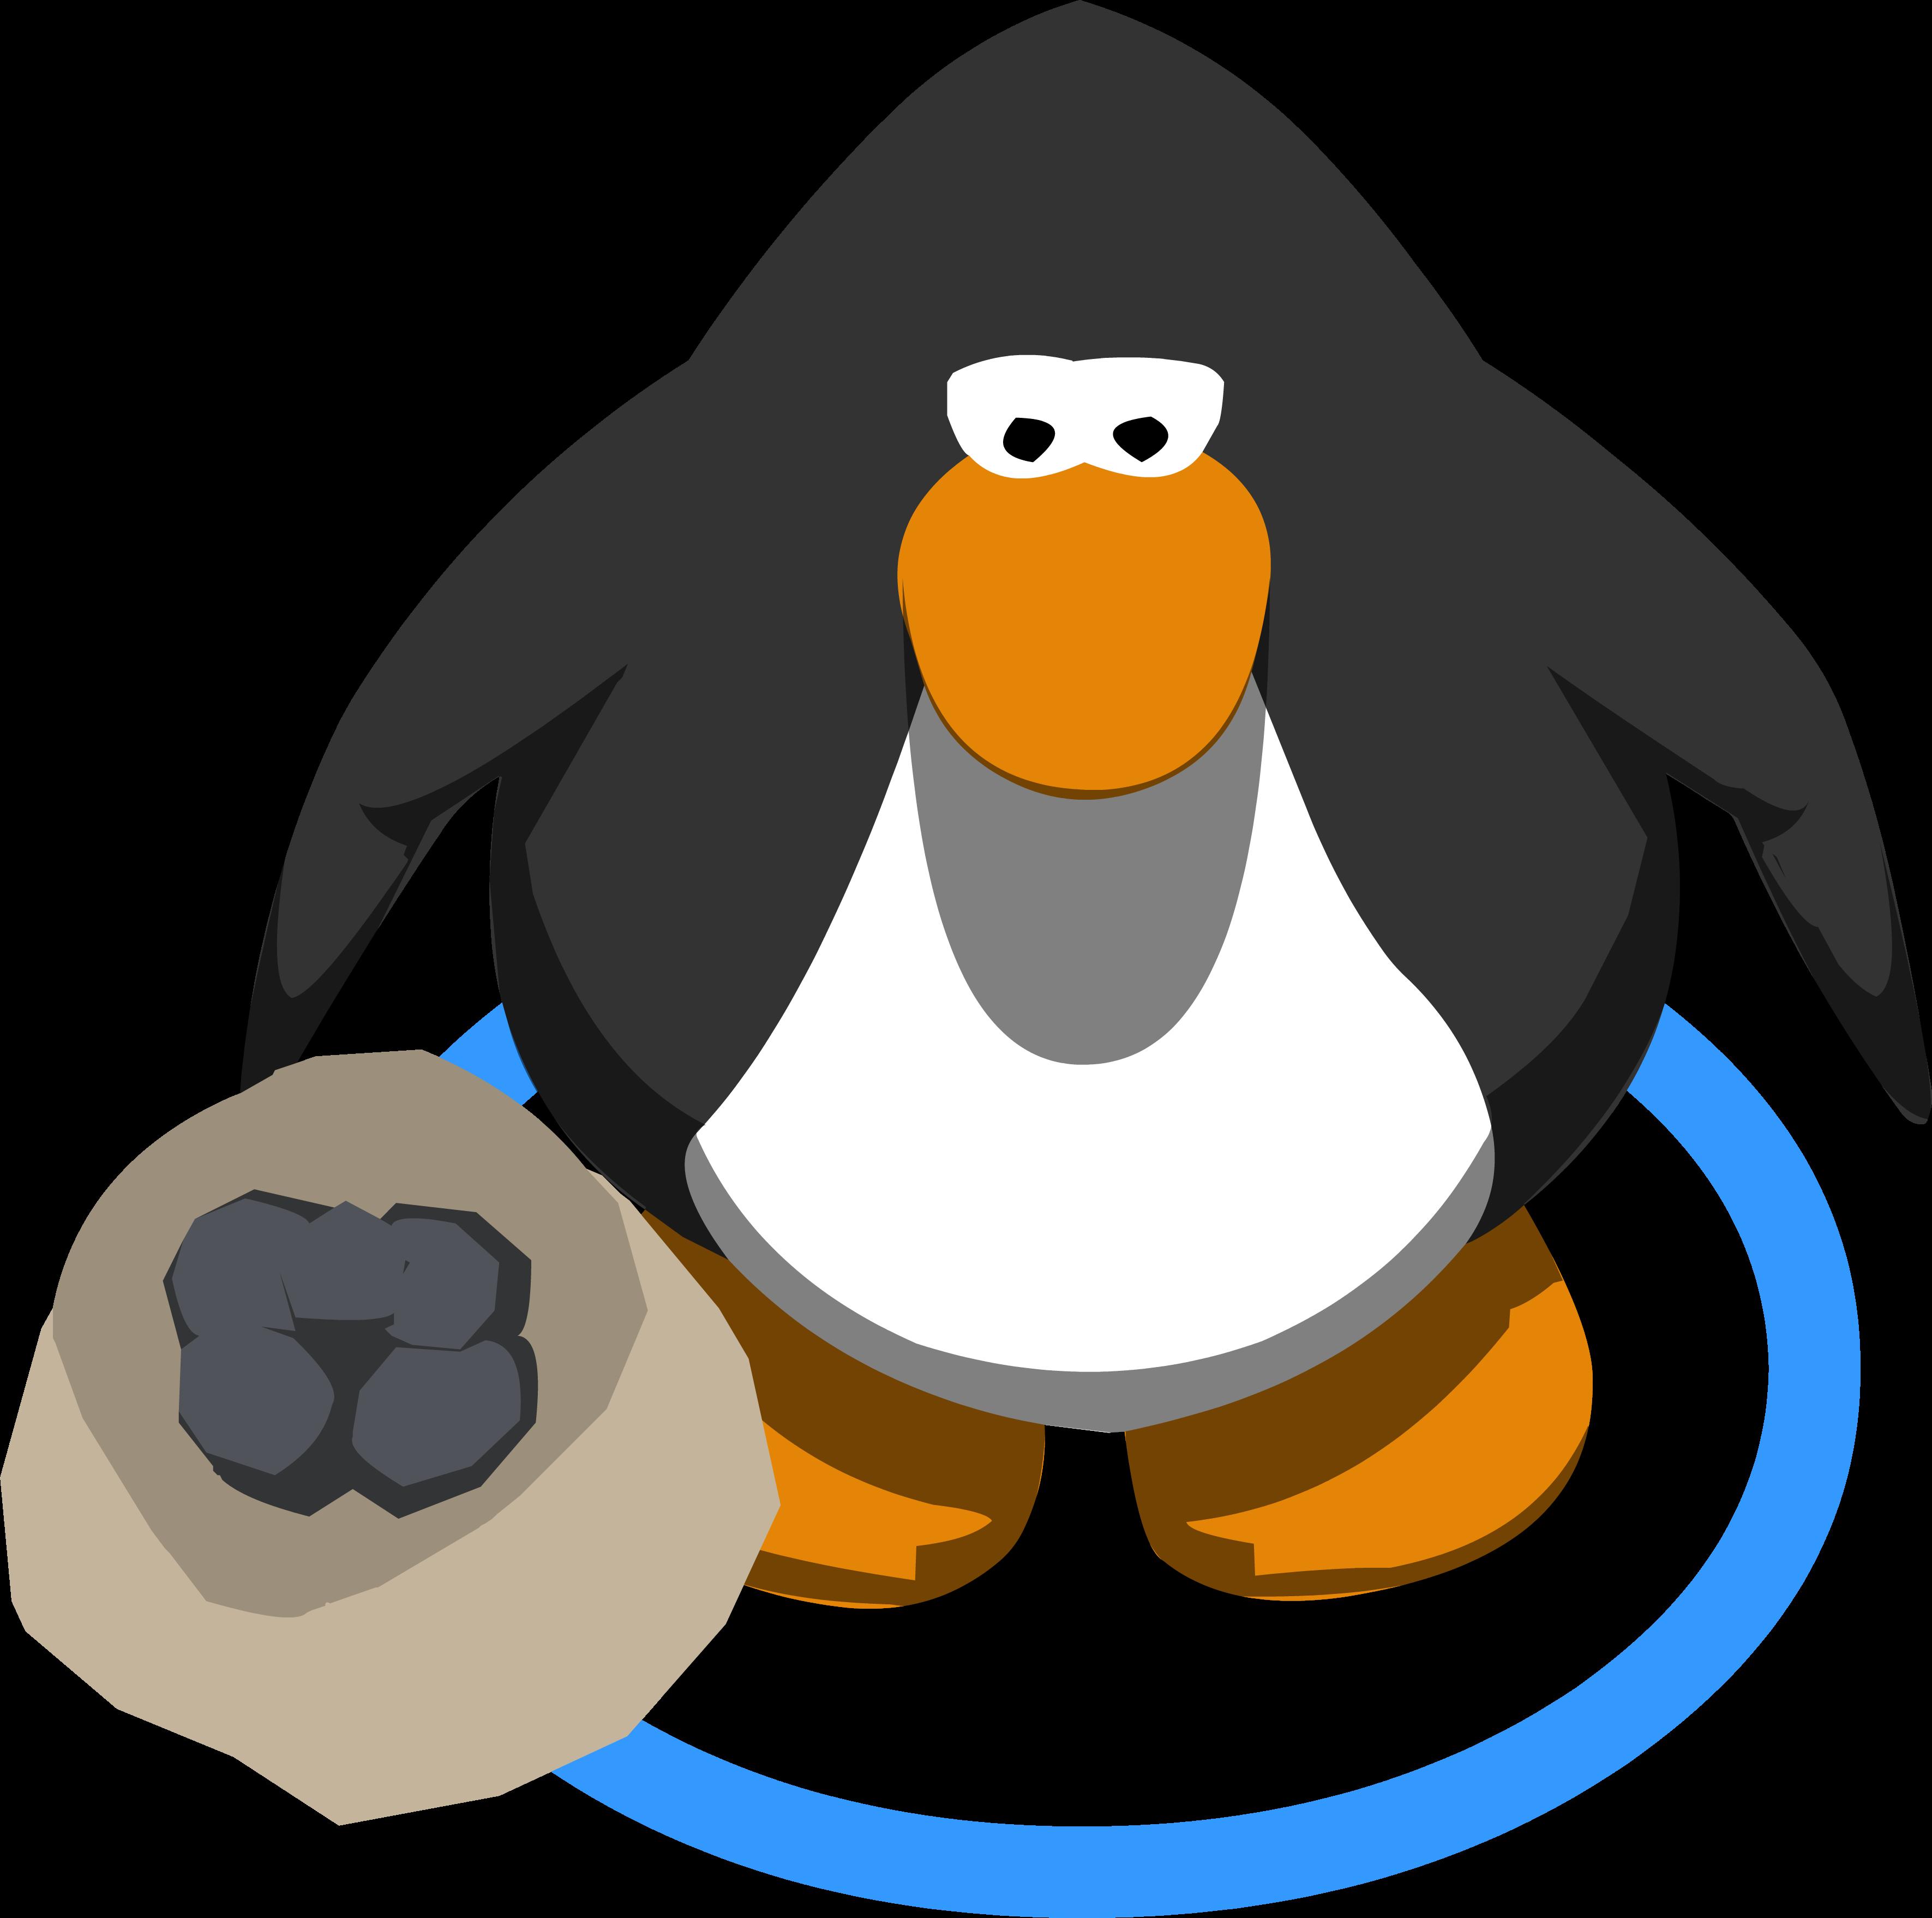 Coal clipart bag coal. Image of in game